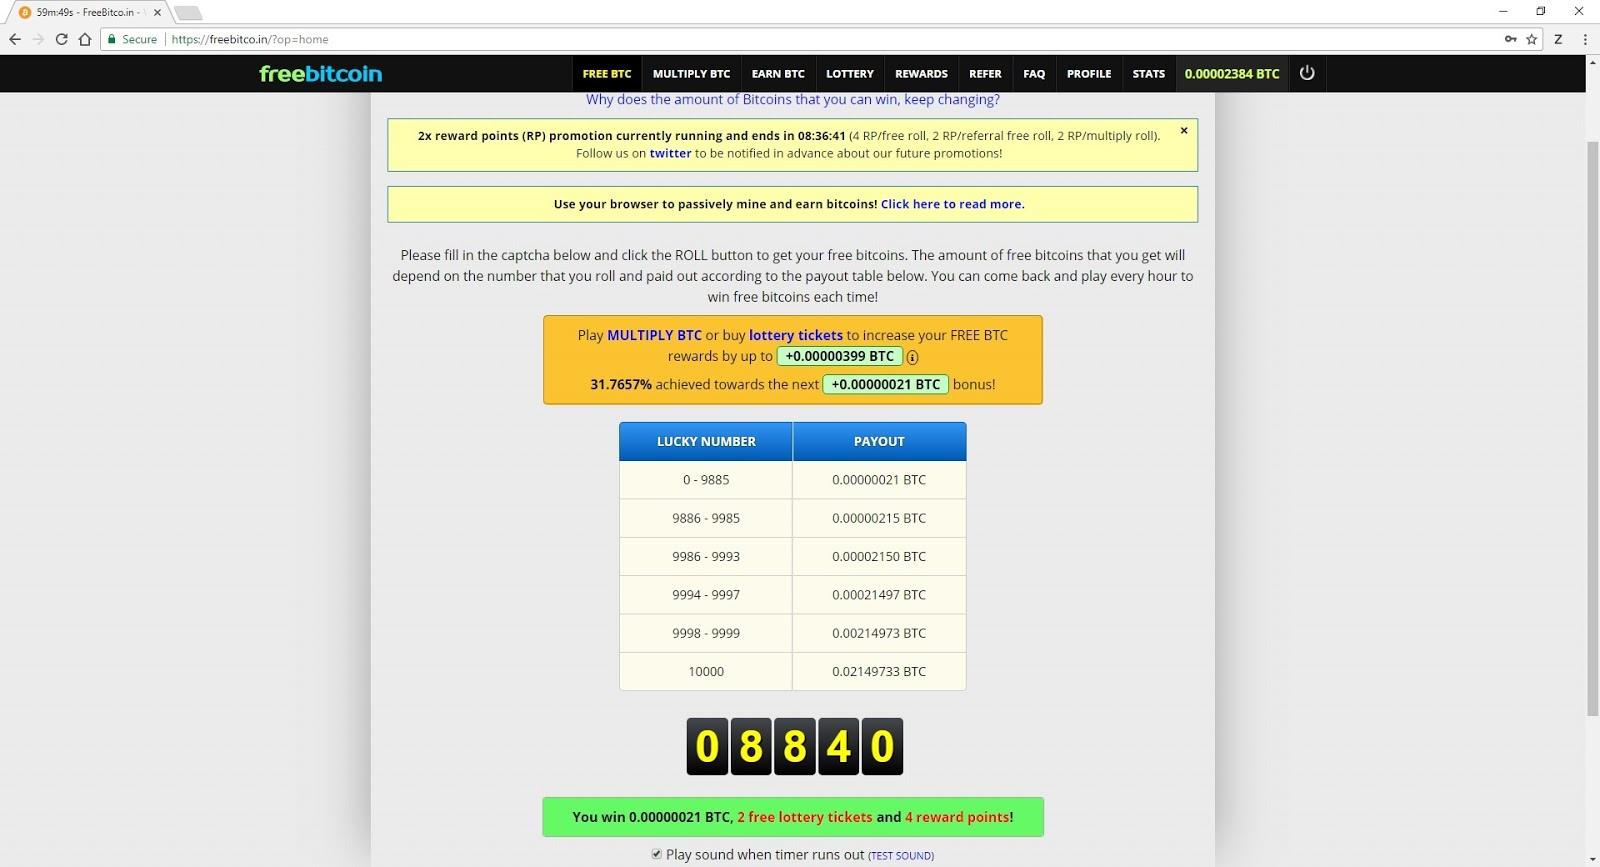 posibilitatea de a câștiga Bitcoin)